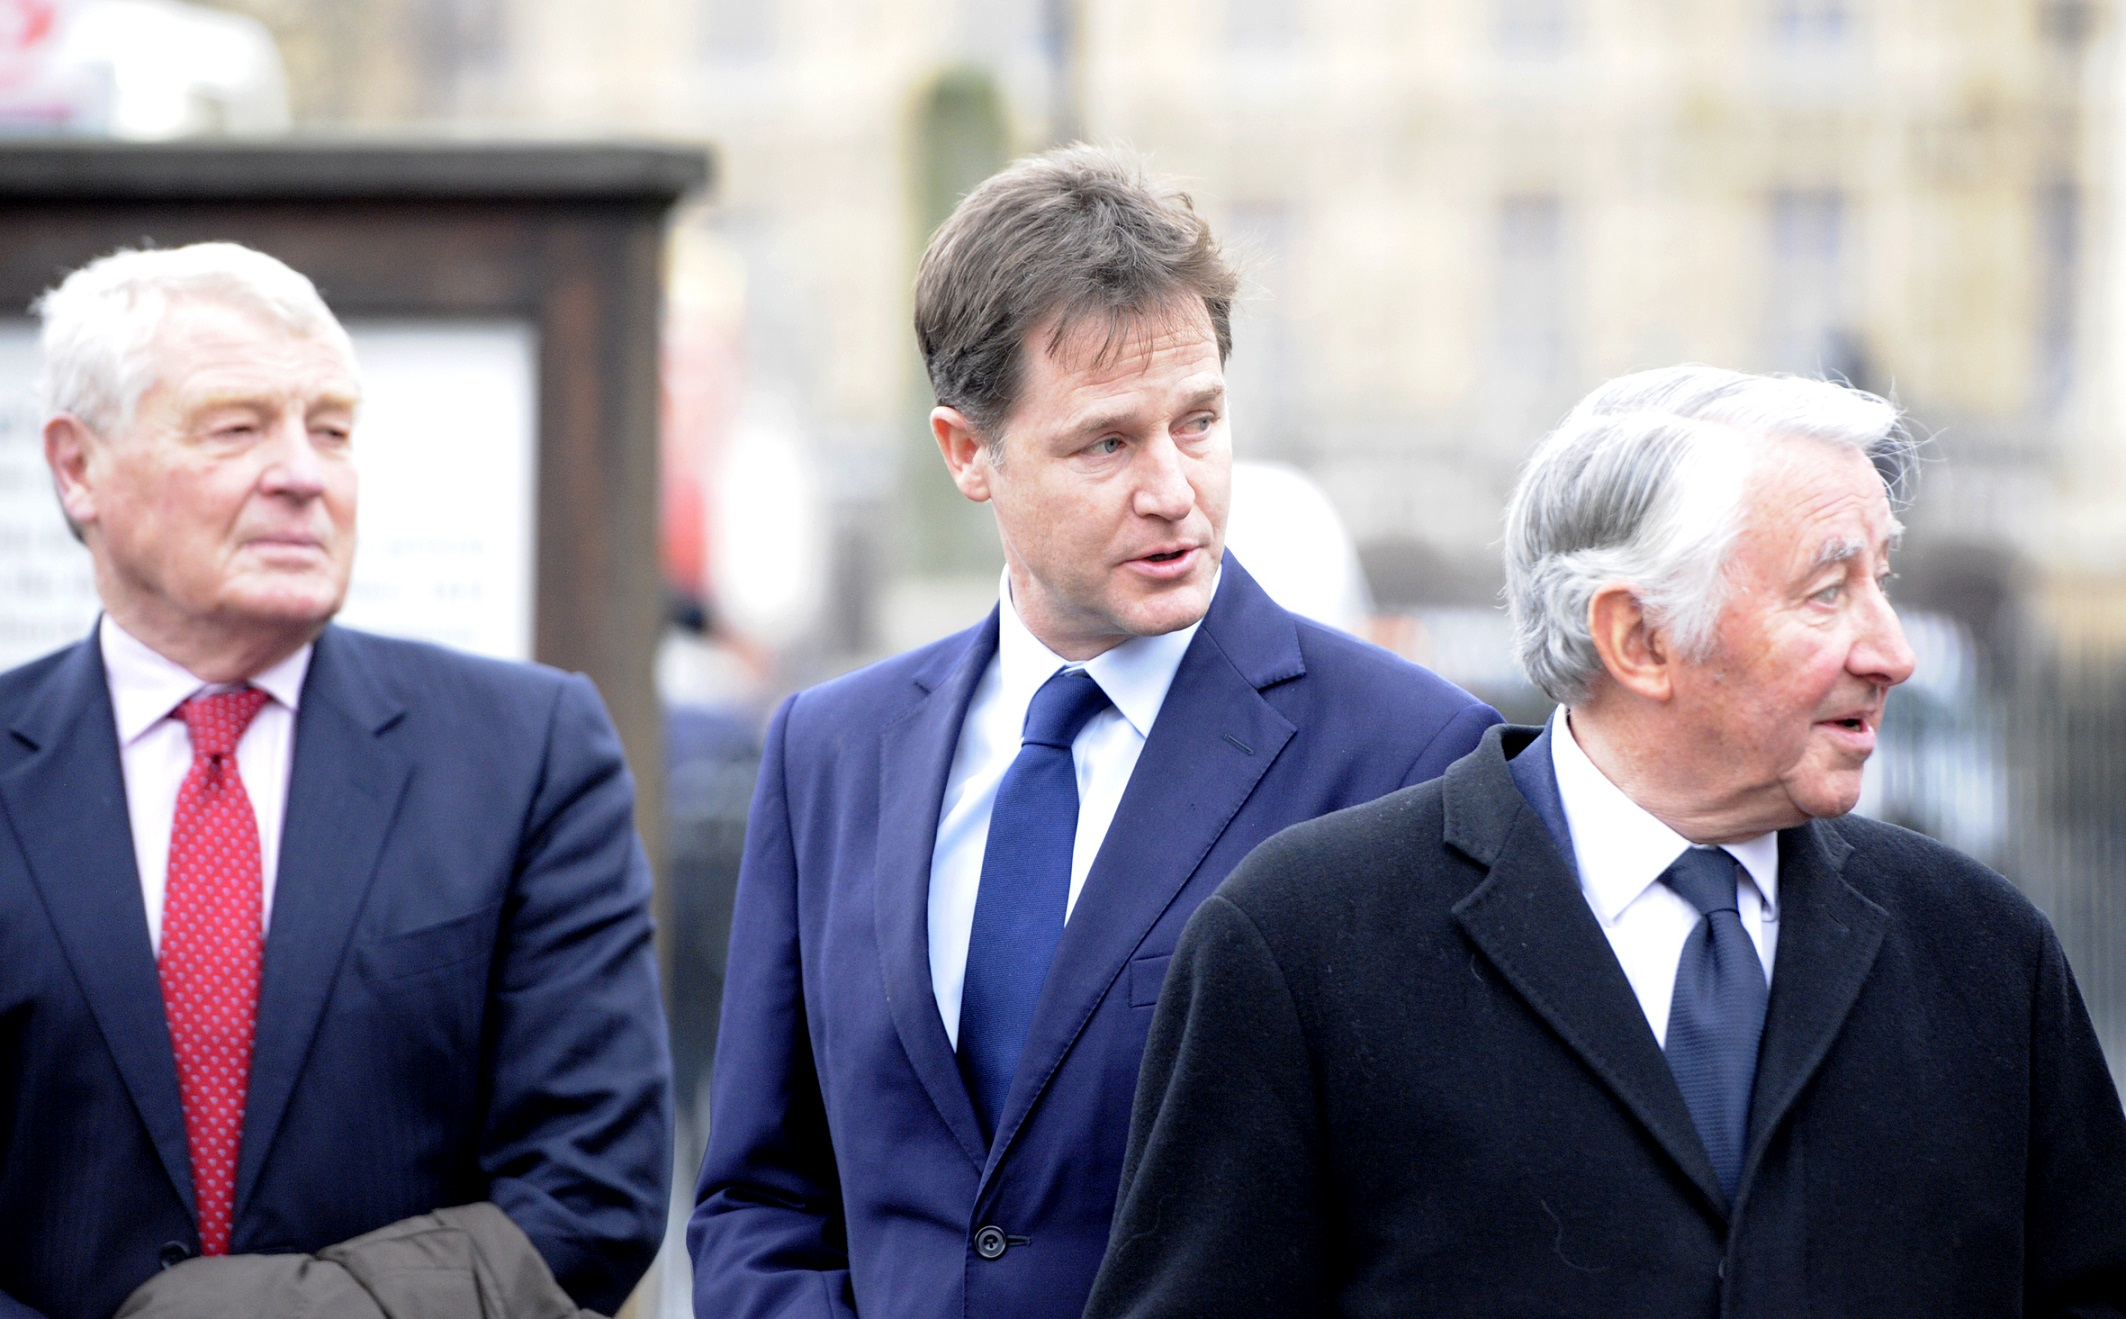 Lord Steel, Nick Clegg, Paddy Ashdown